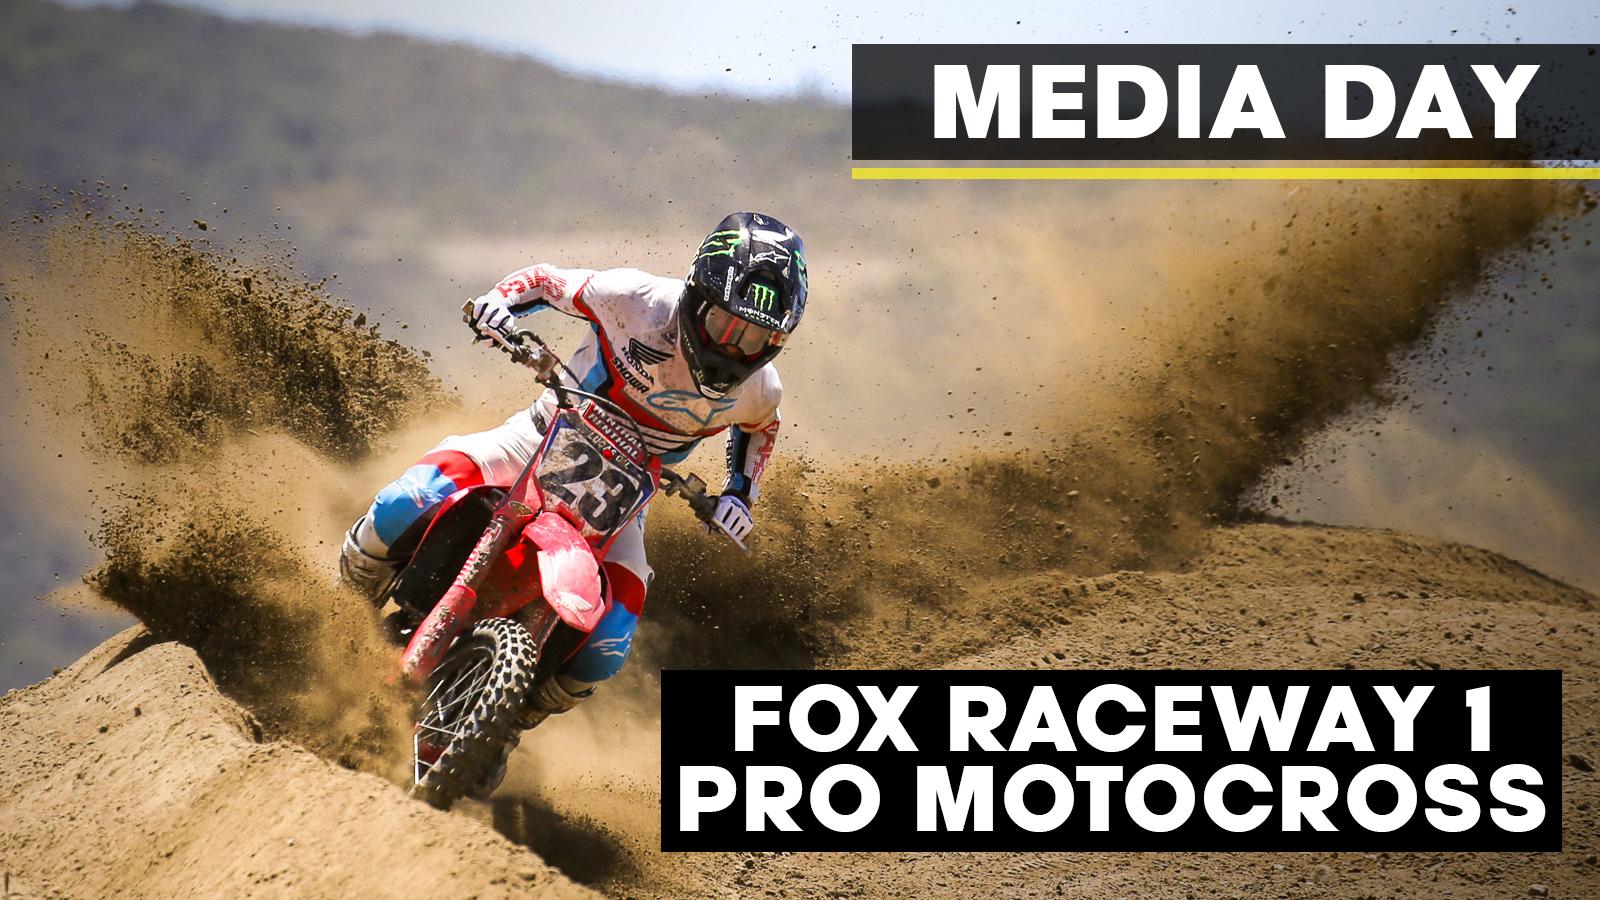 Fox Raceway 1   Pro Motocross Media Day